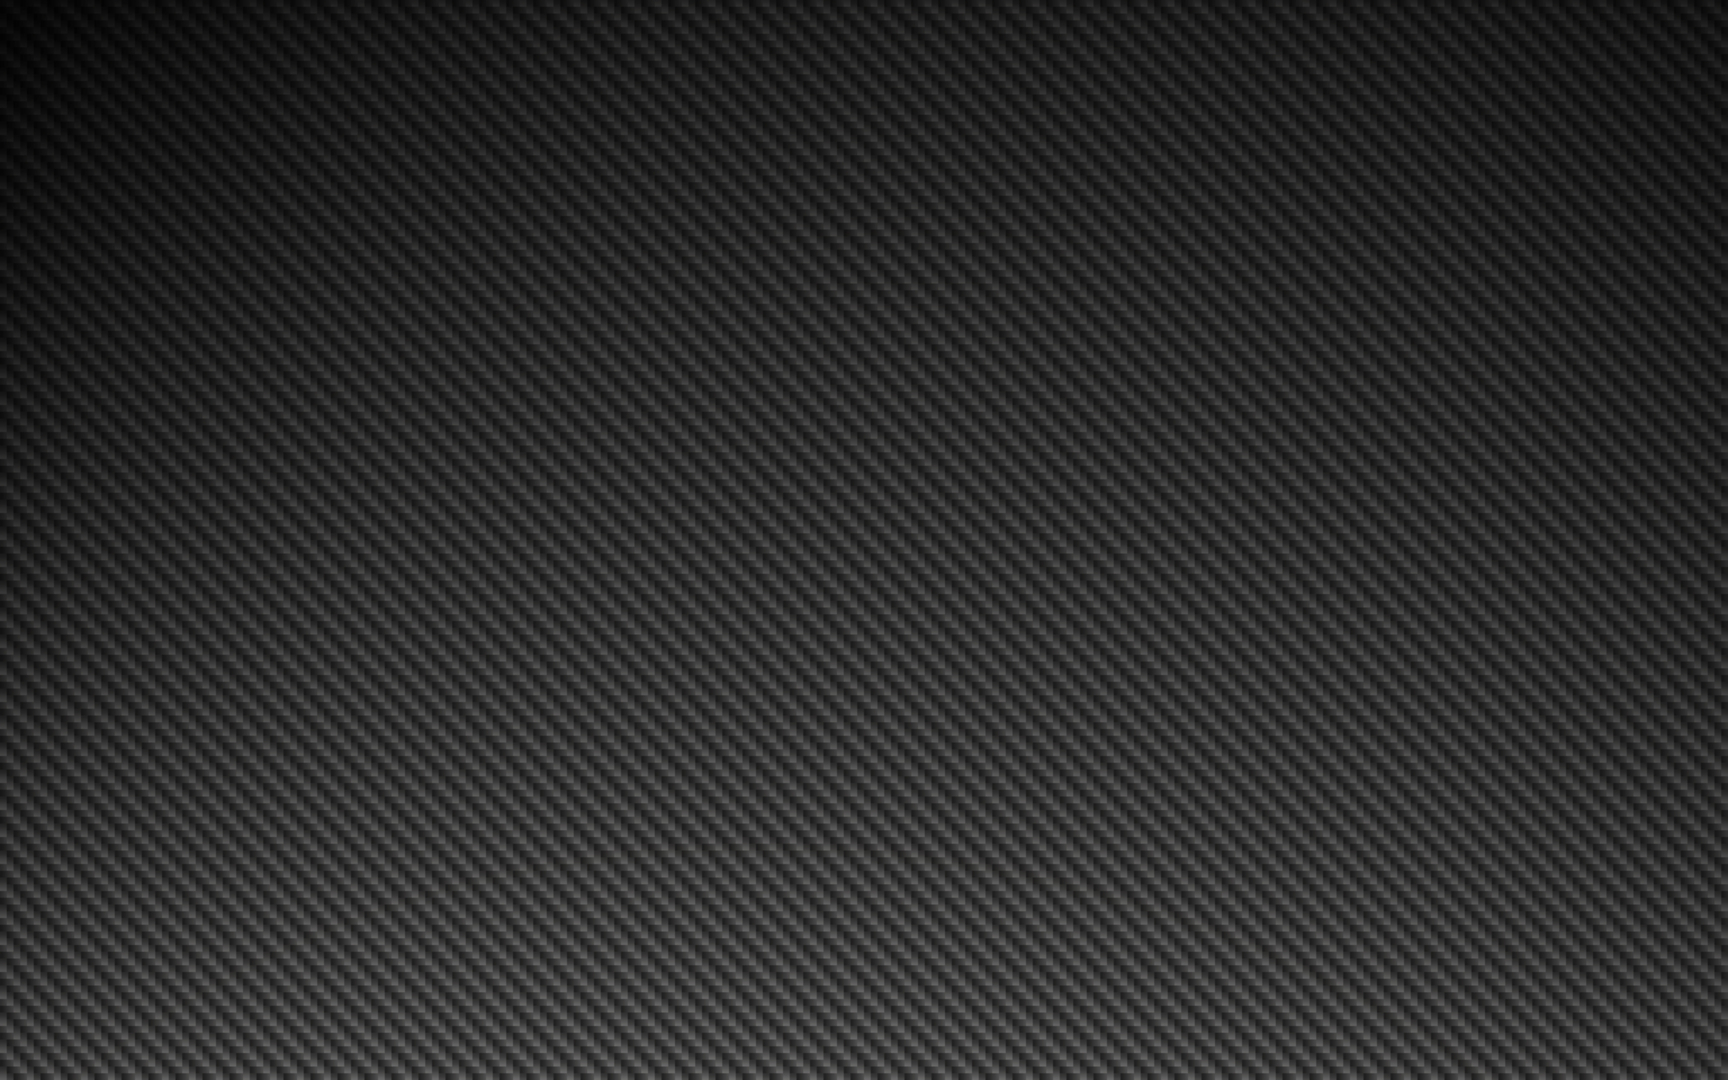 1920x1080 free carbon fiber wallpaper ebin5 1728x1080